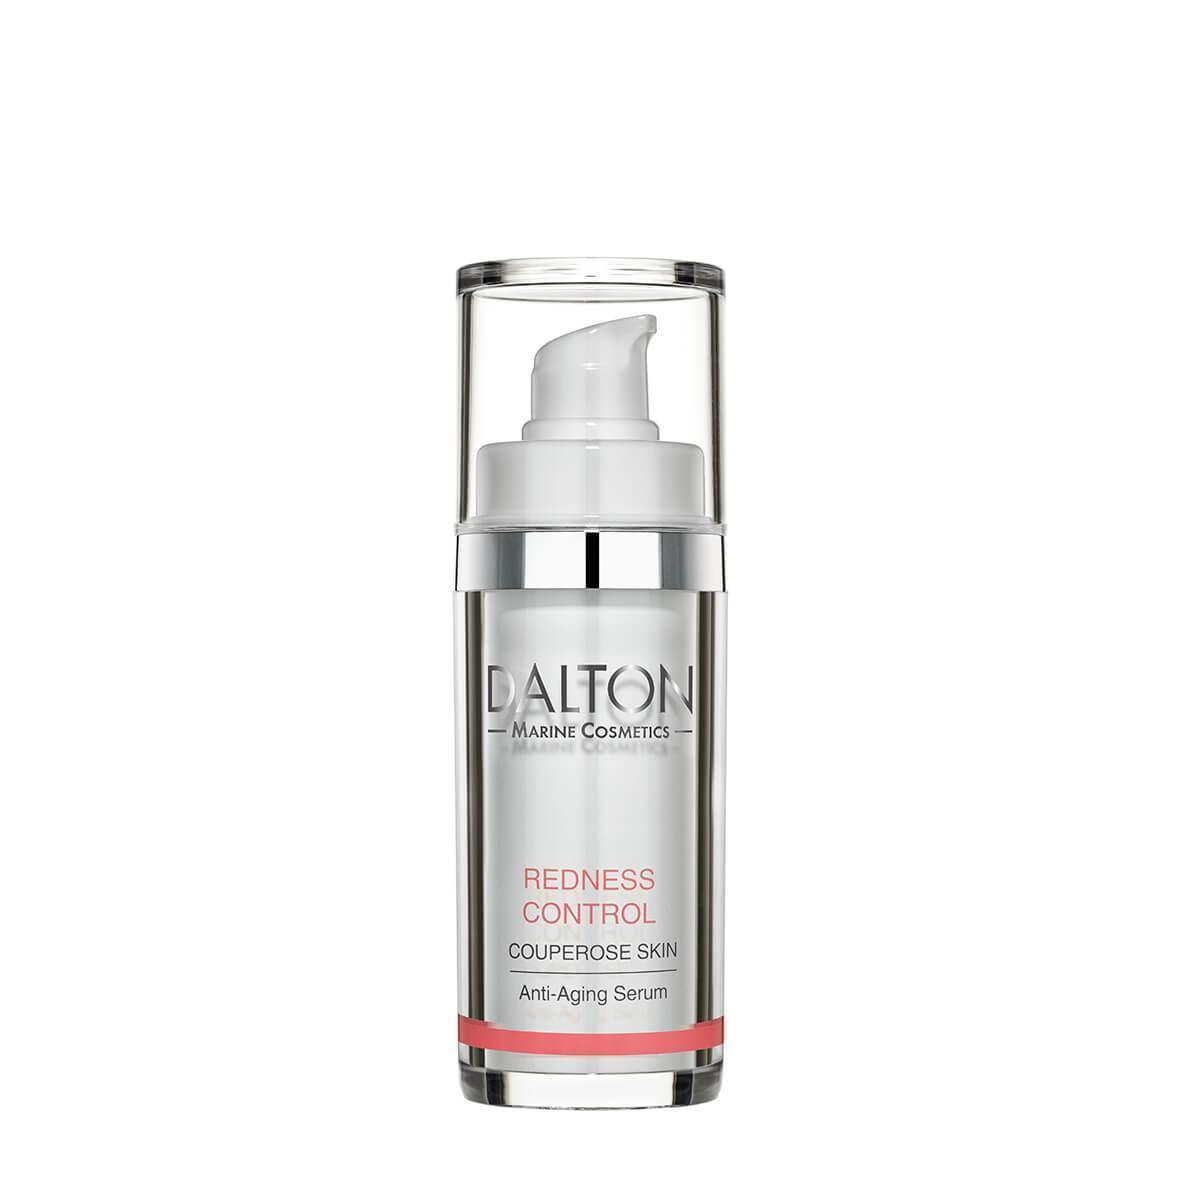 Redness Control Anti-Aging Serum 30 ml